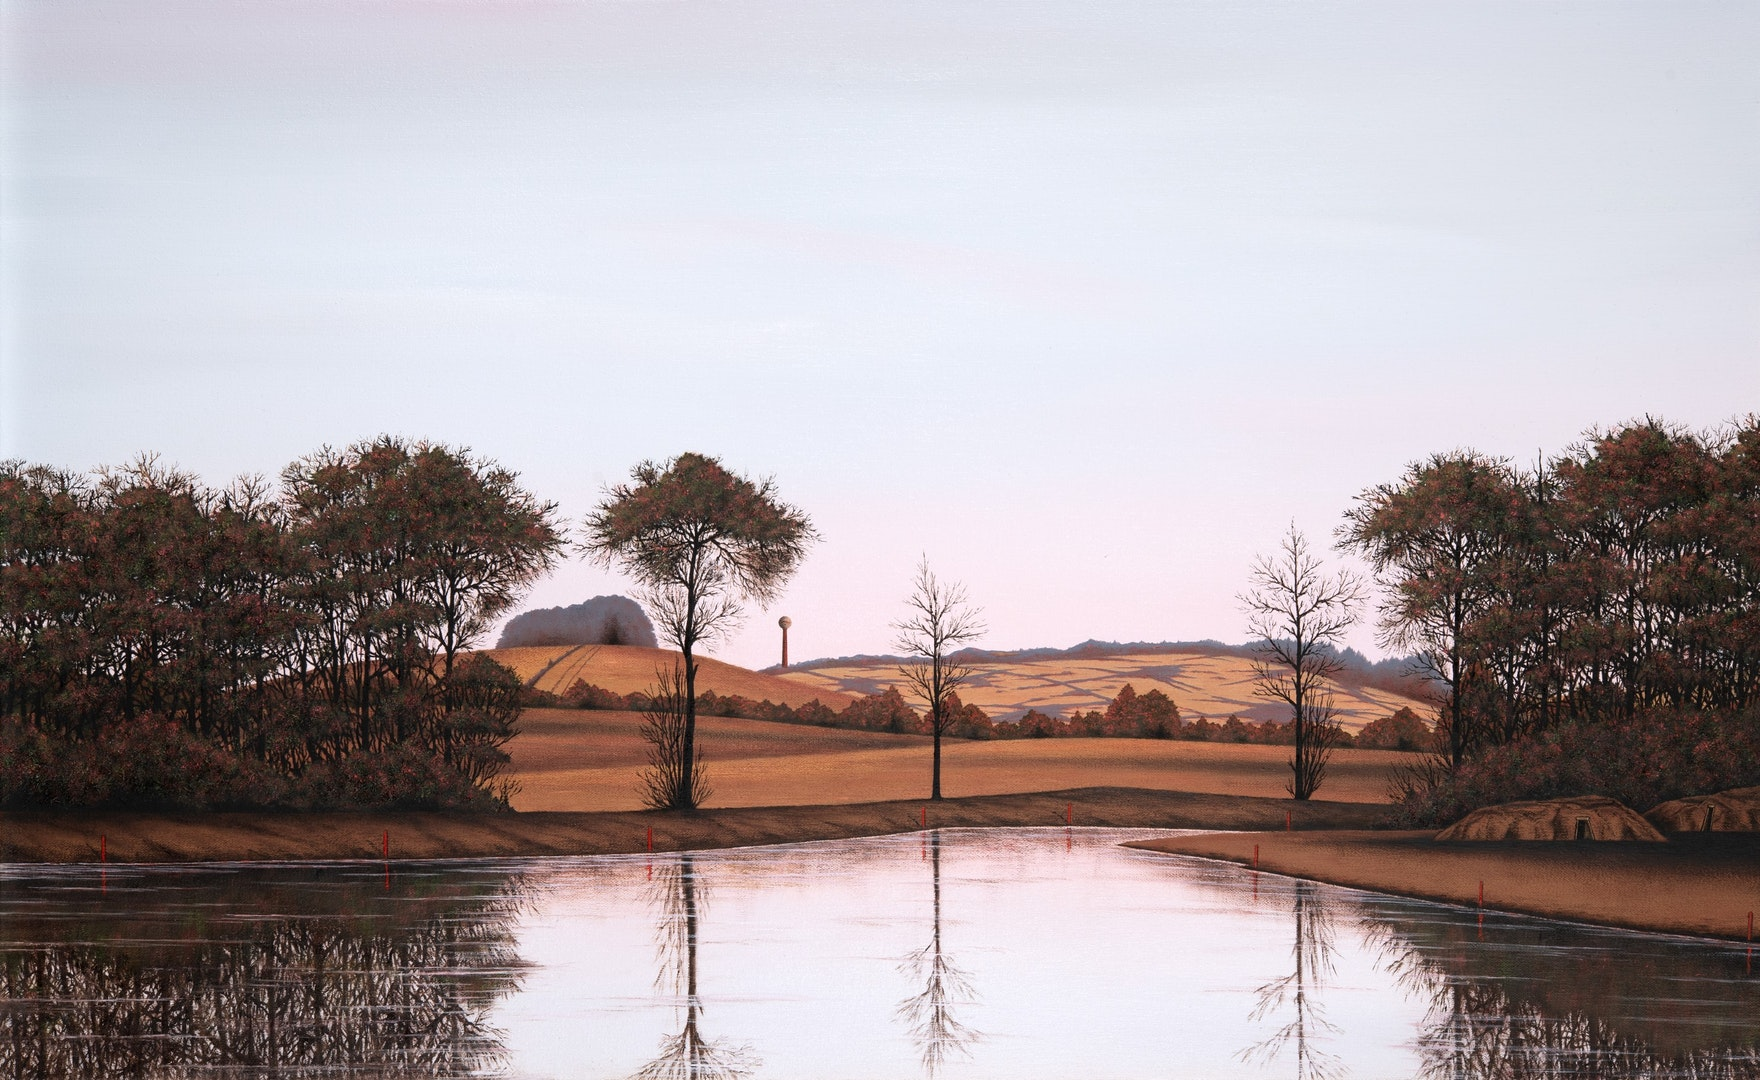 'Firestone 7', David Rae, Oil on canvas, 50 x 81 cm